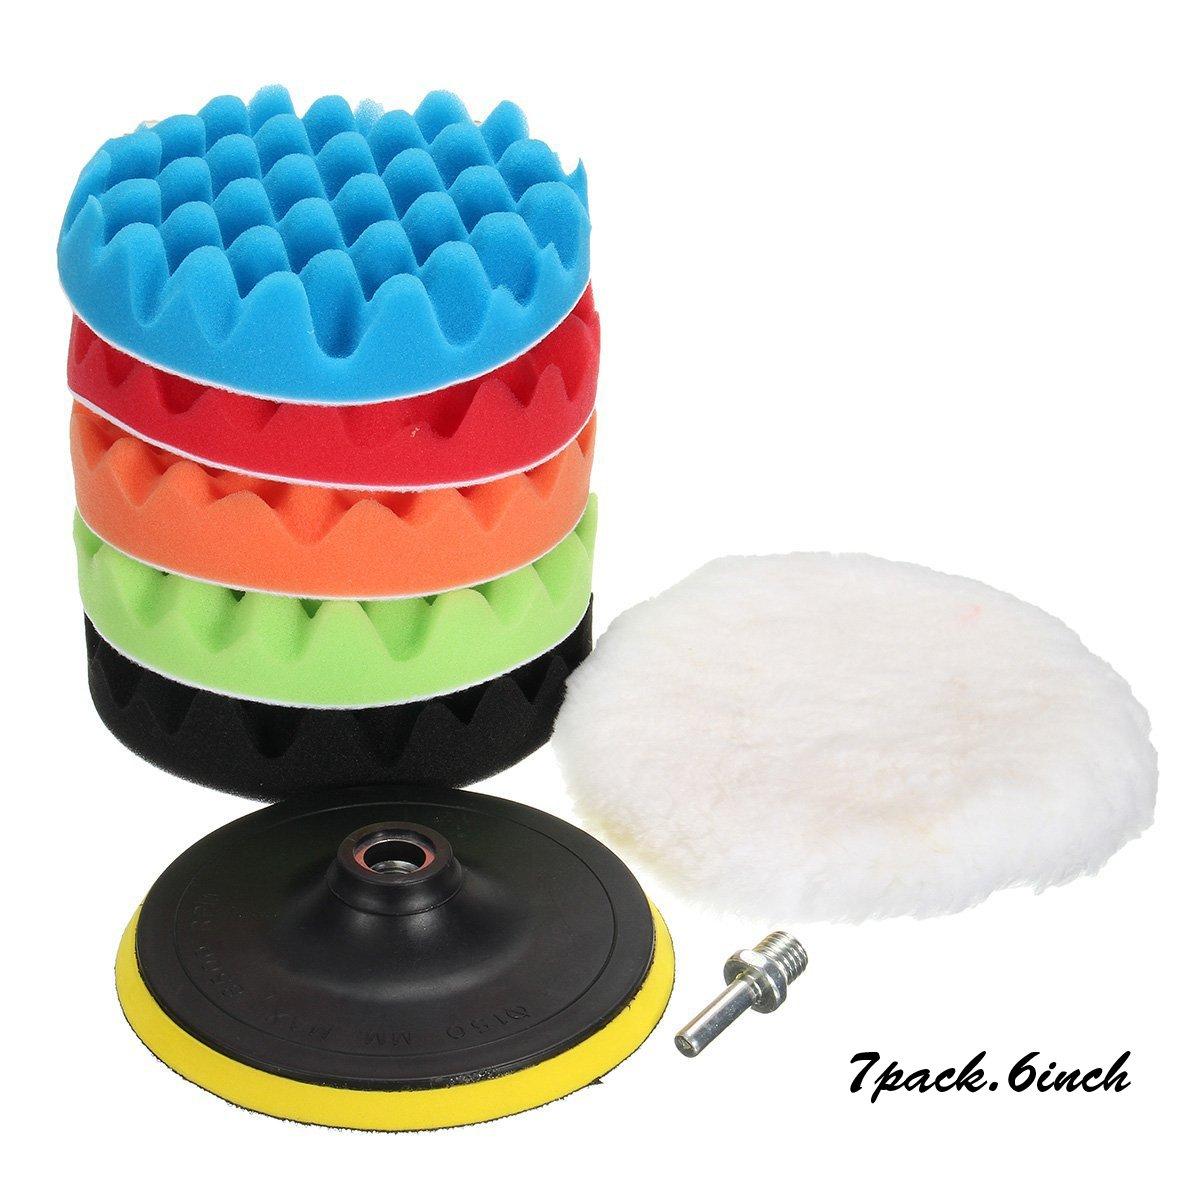 MATCC 7Pcs 6inch Polishing pads,Sponge and Woolen Polishing Waxing Buffing Pads Kits with M14 Drill Adapter, 6inchs